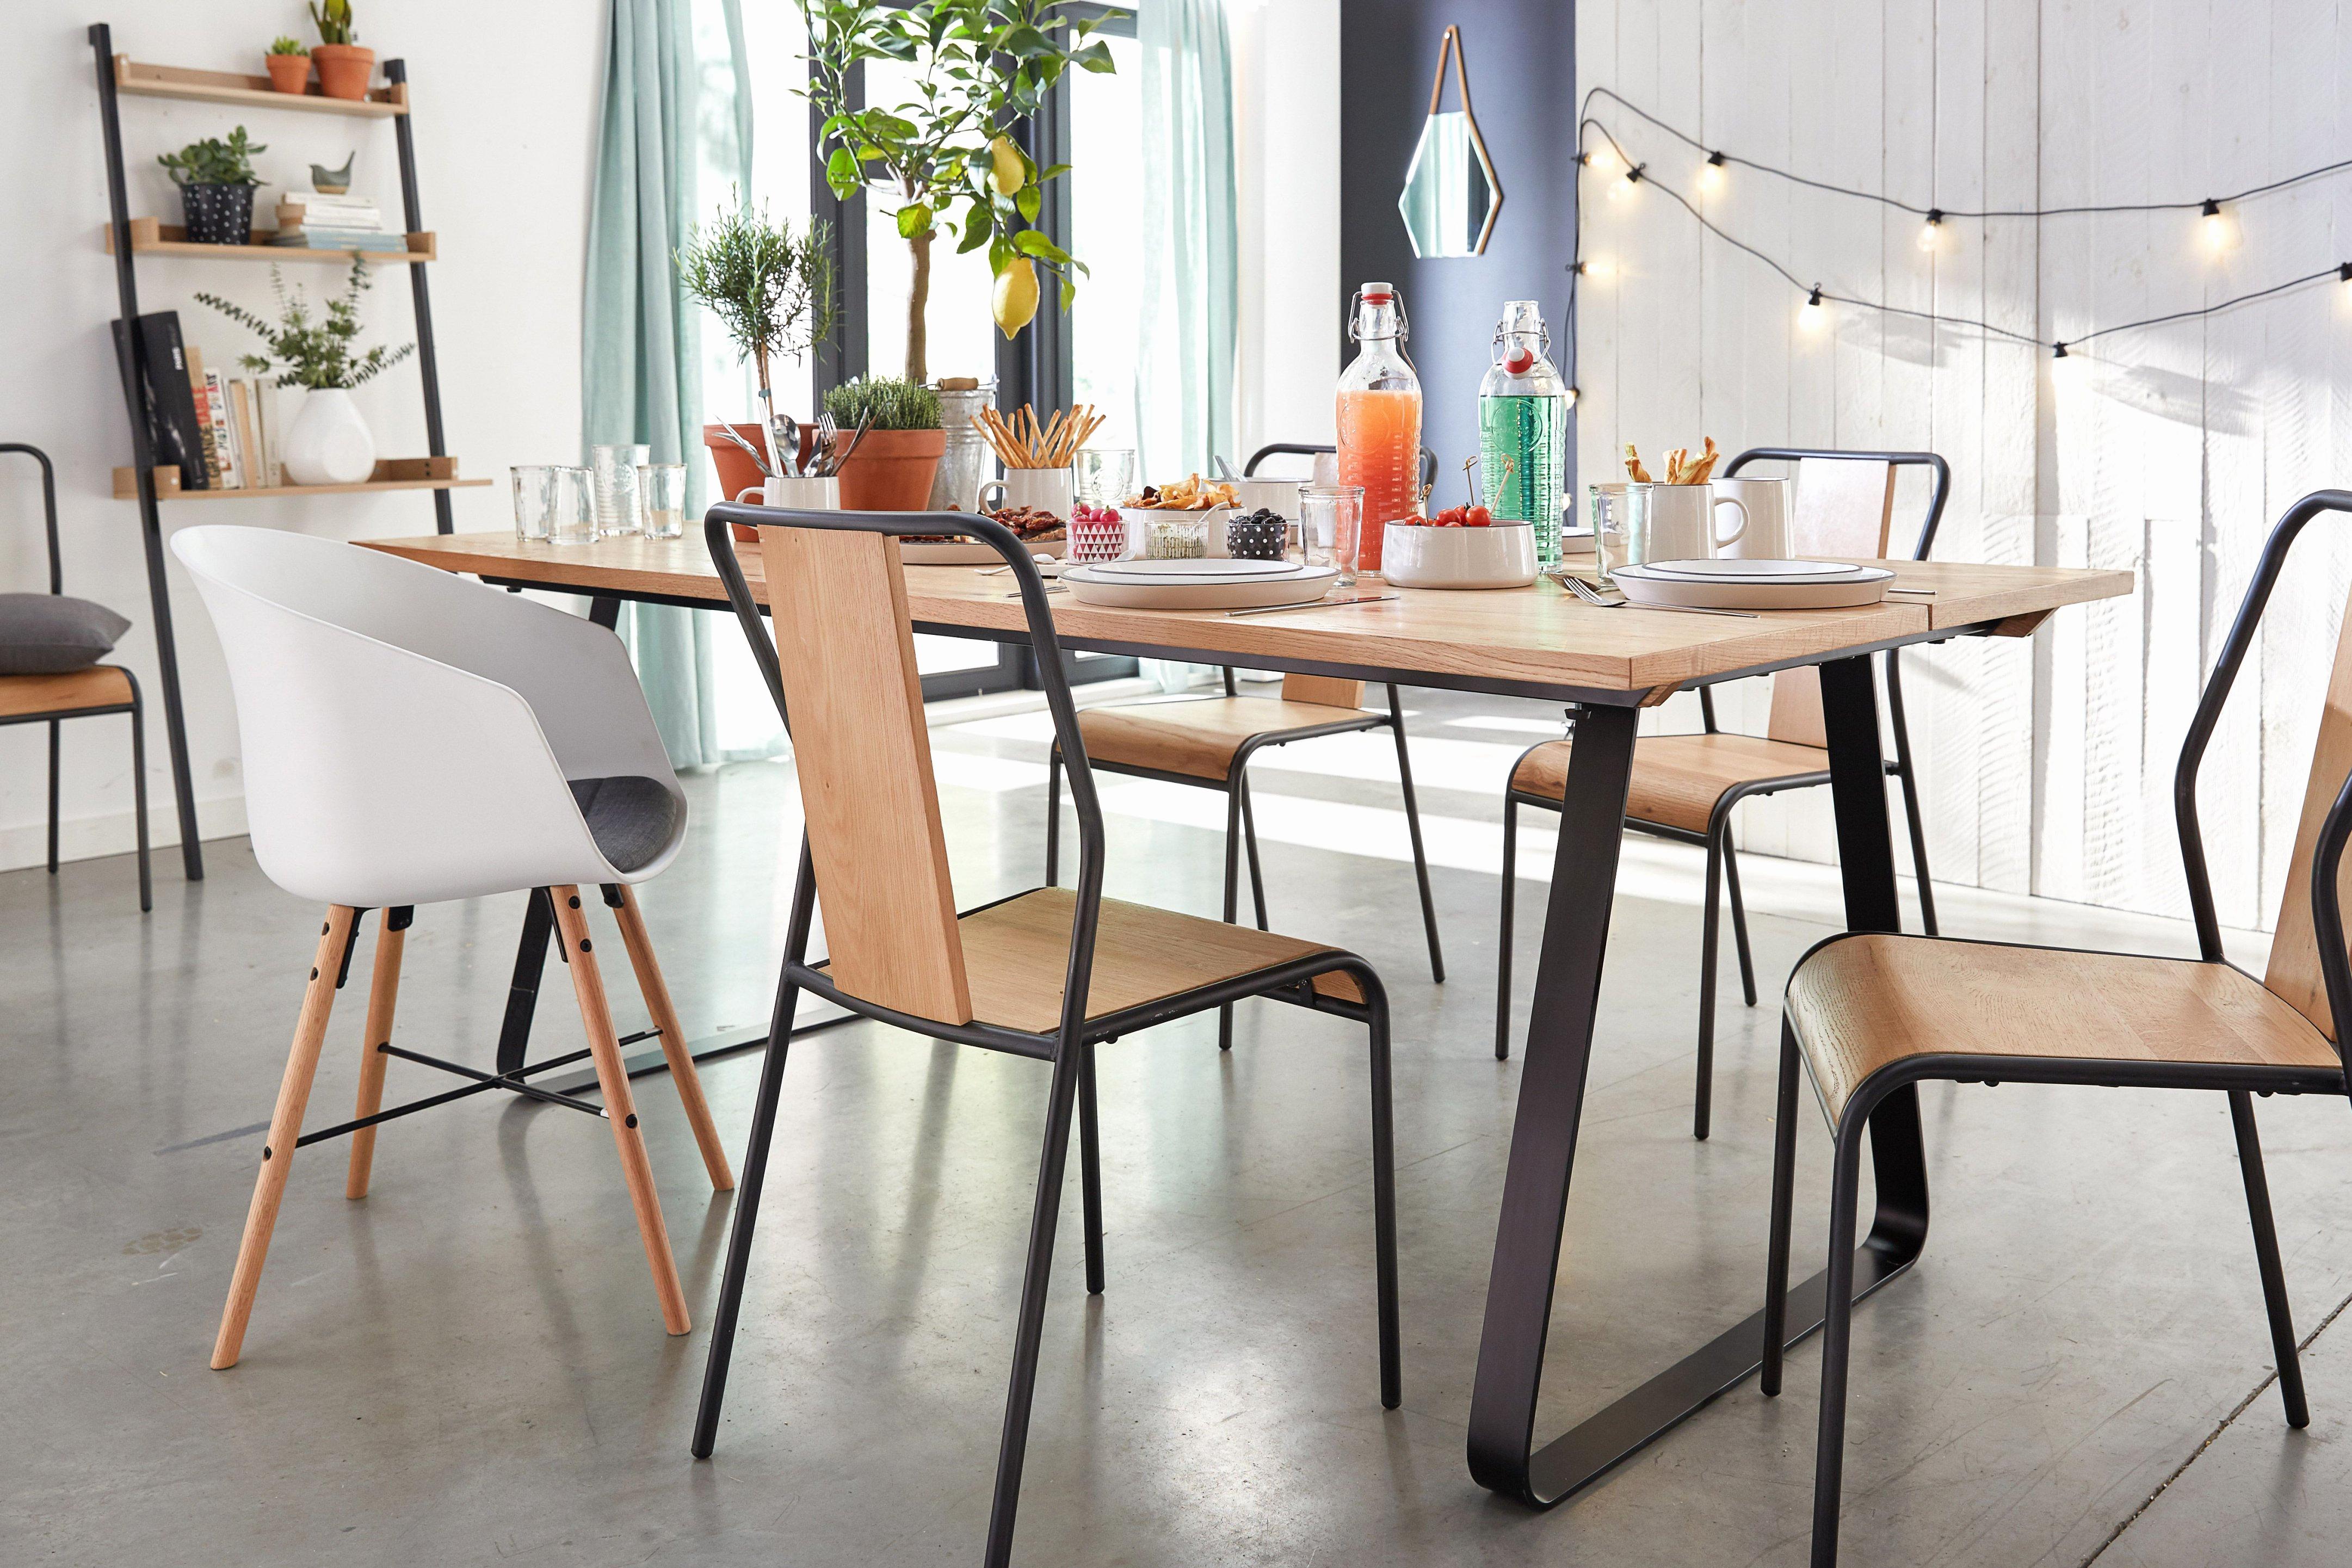 Table Salle A Manger Extensible Fly Frais Table Manger dedans Table Salle A Manger Extensible Fly